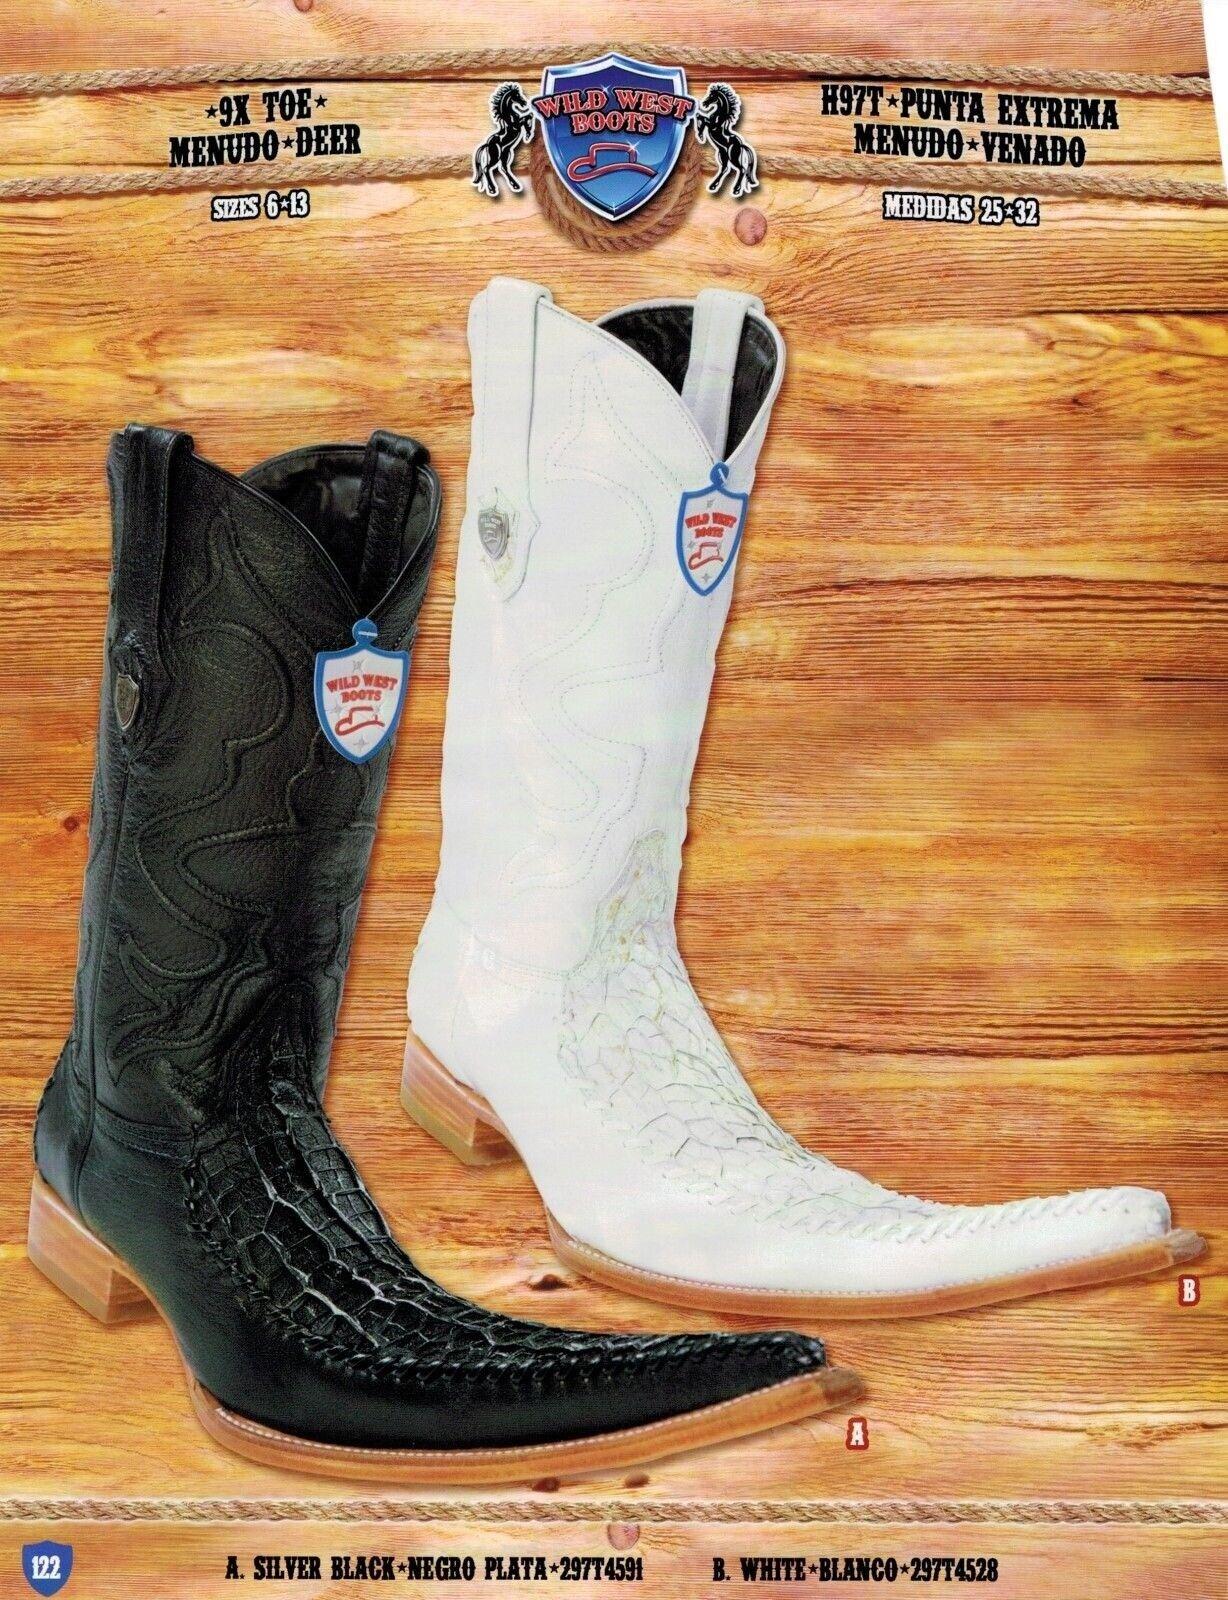 alta qualità genuina Wild West Uomo 9X-Toe Menudo Deer Cowboy Cowboy Cowboy Western stivali Diff. Colores  scelte con prezzo basso